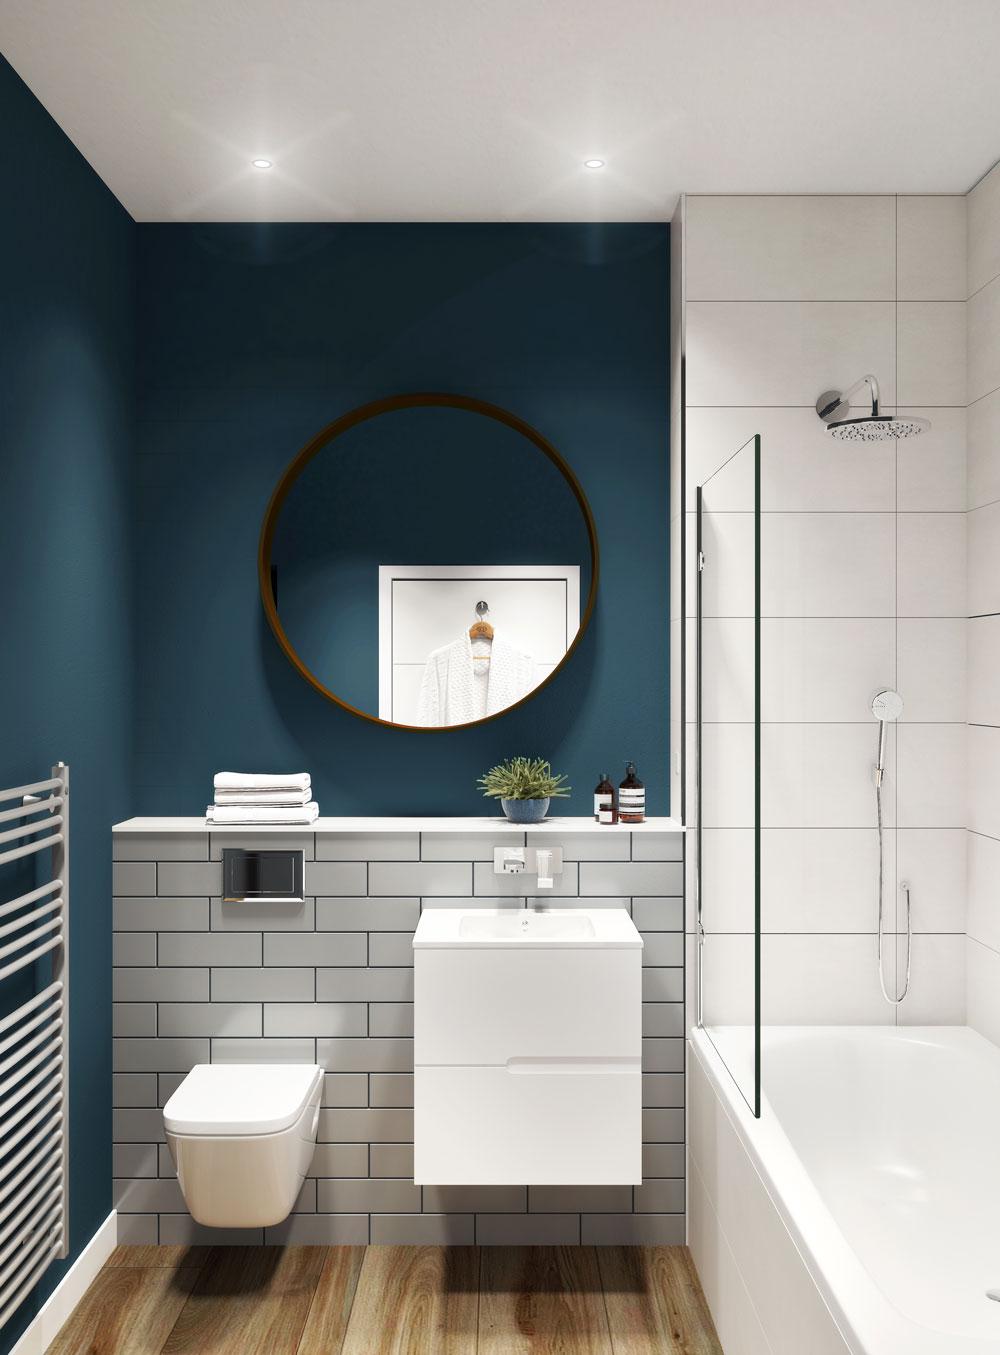 LW_Bathroom_HR.jpg